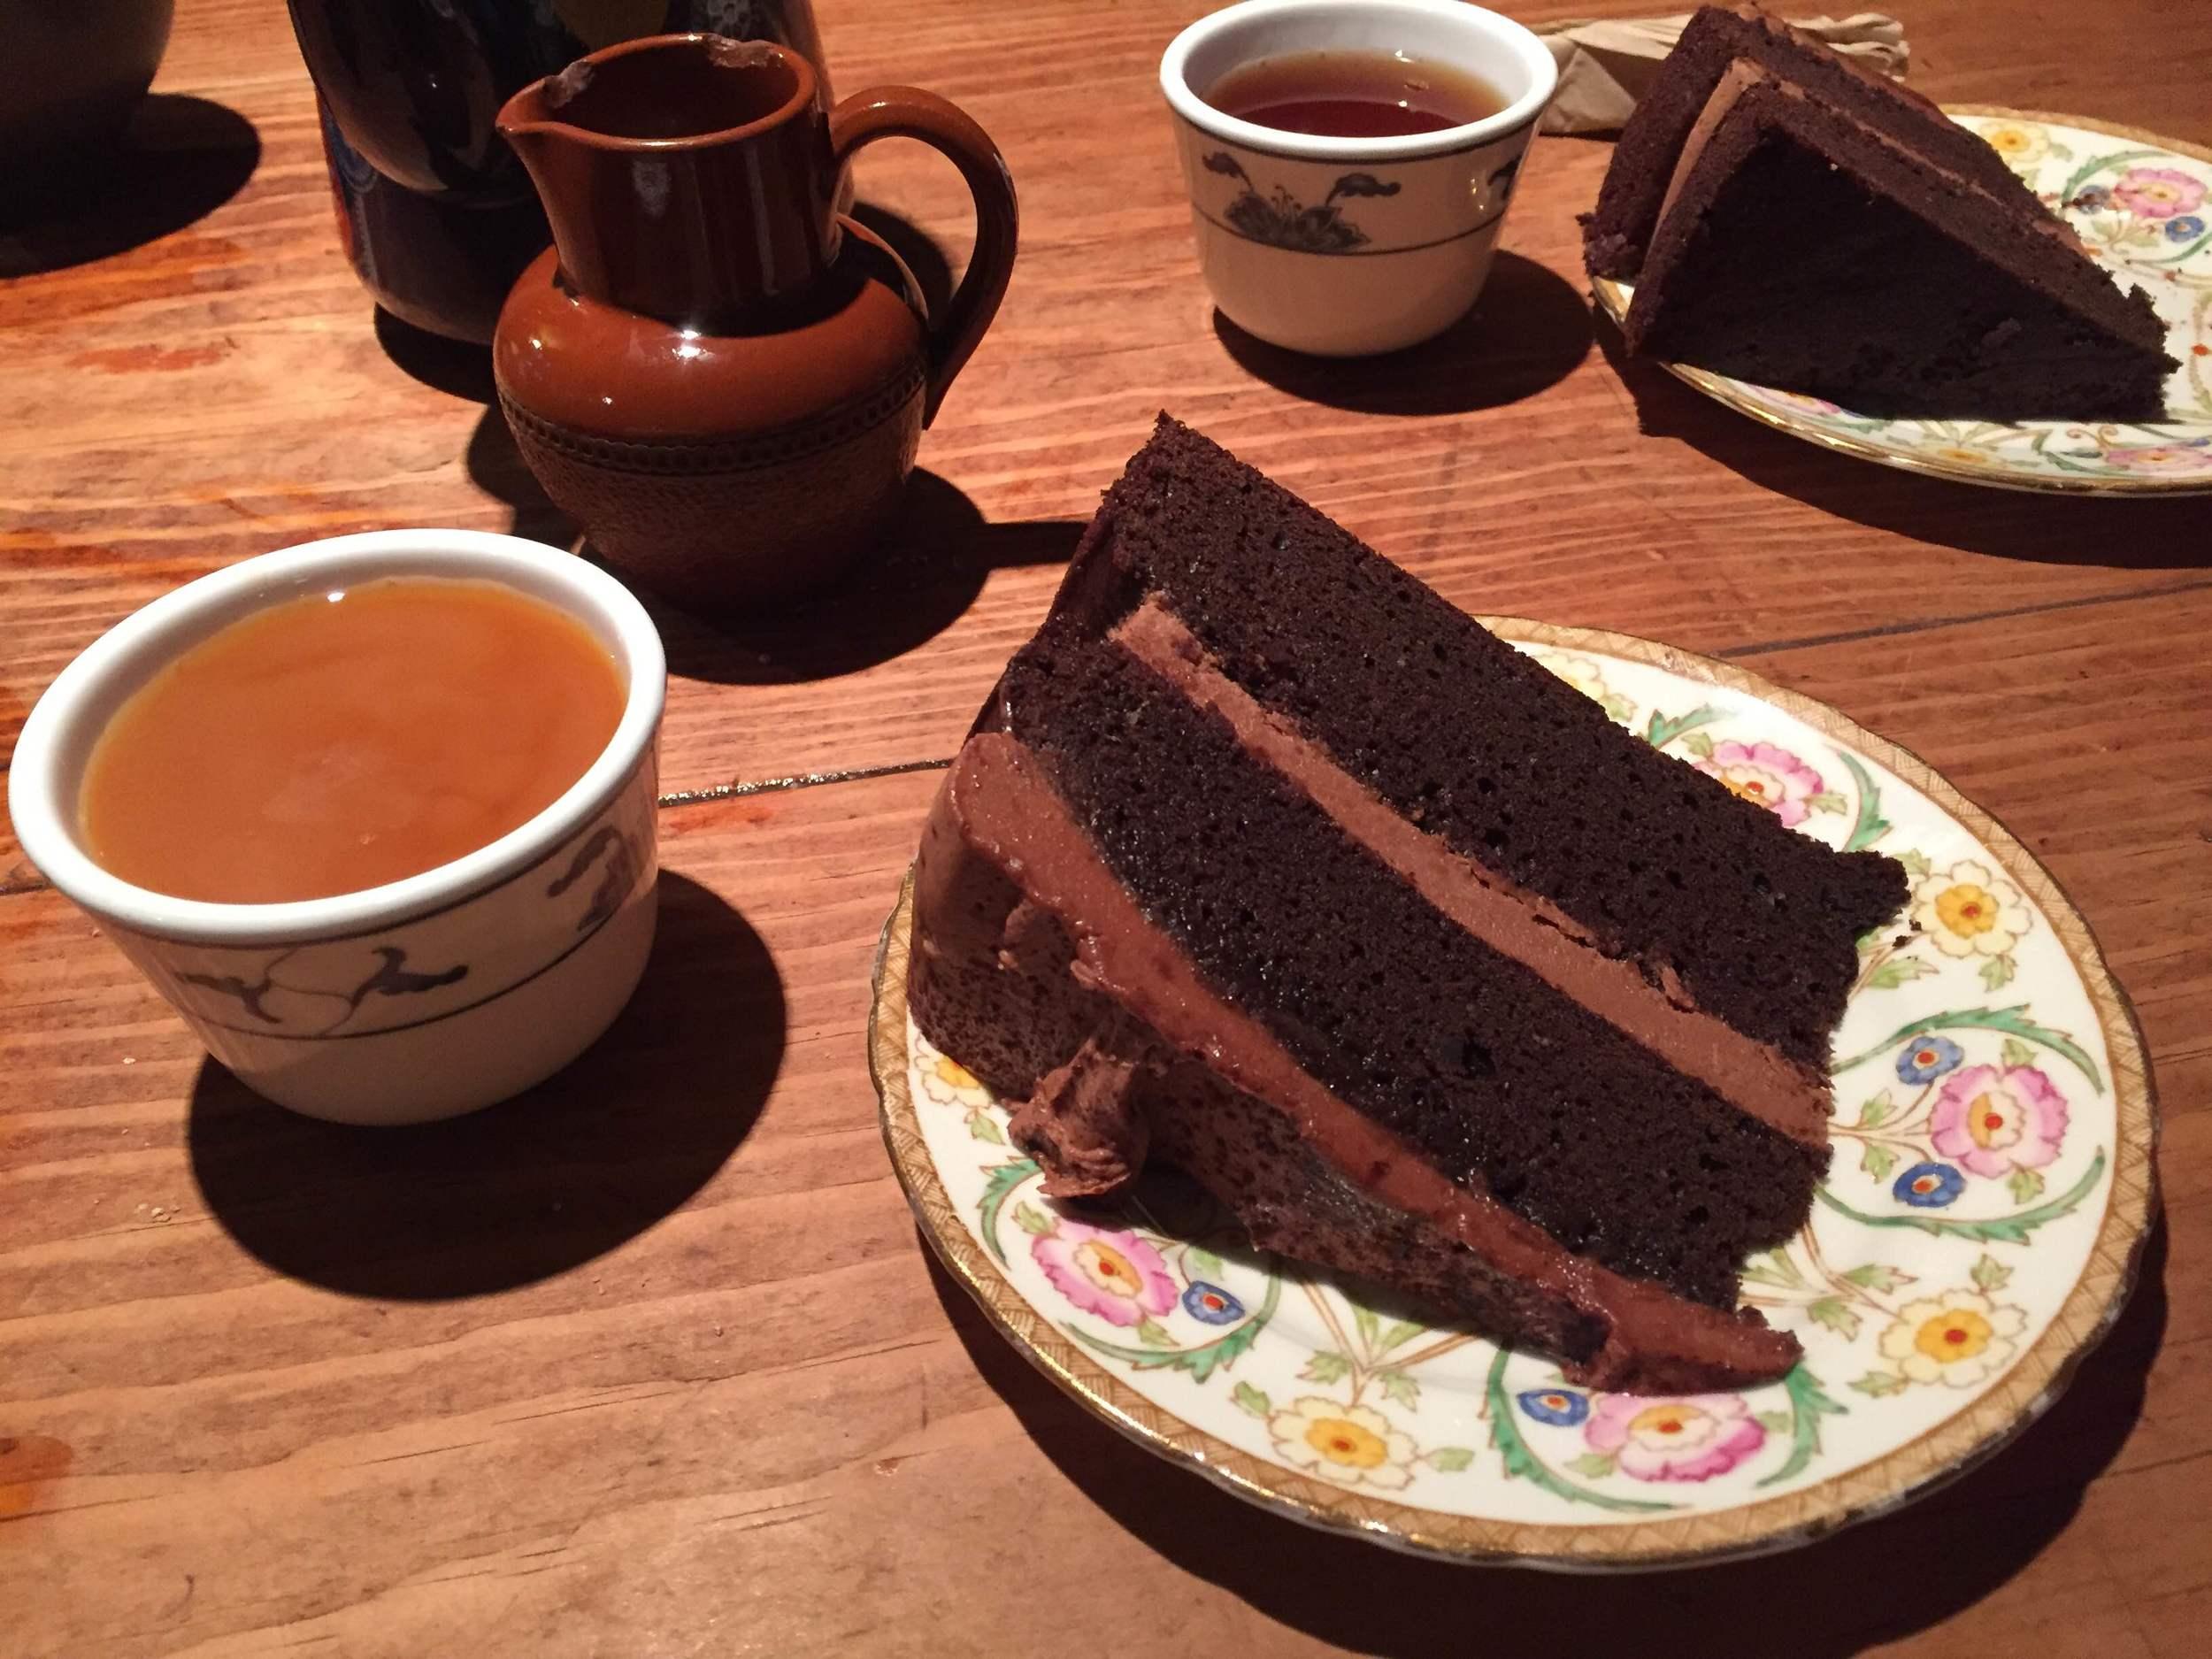 tchai-ovna vegan cake